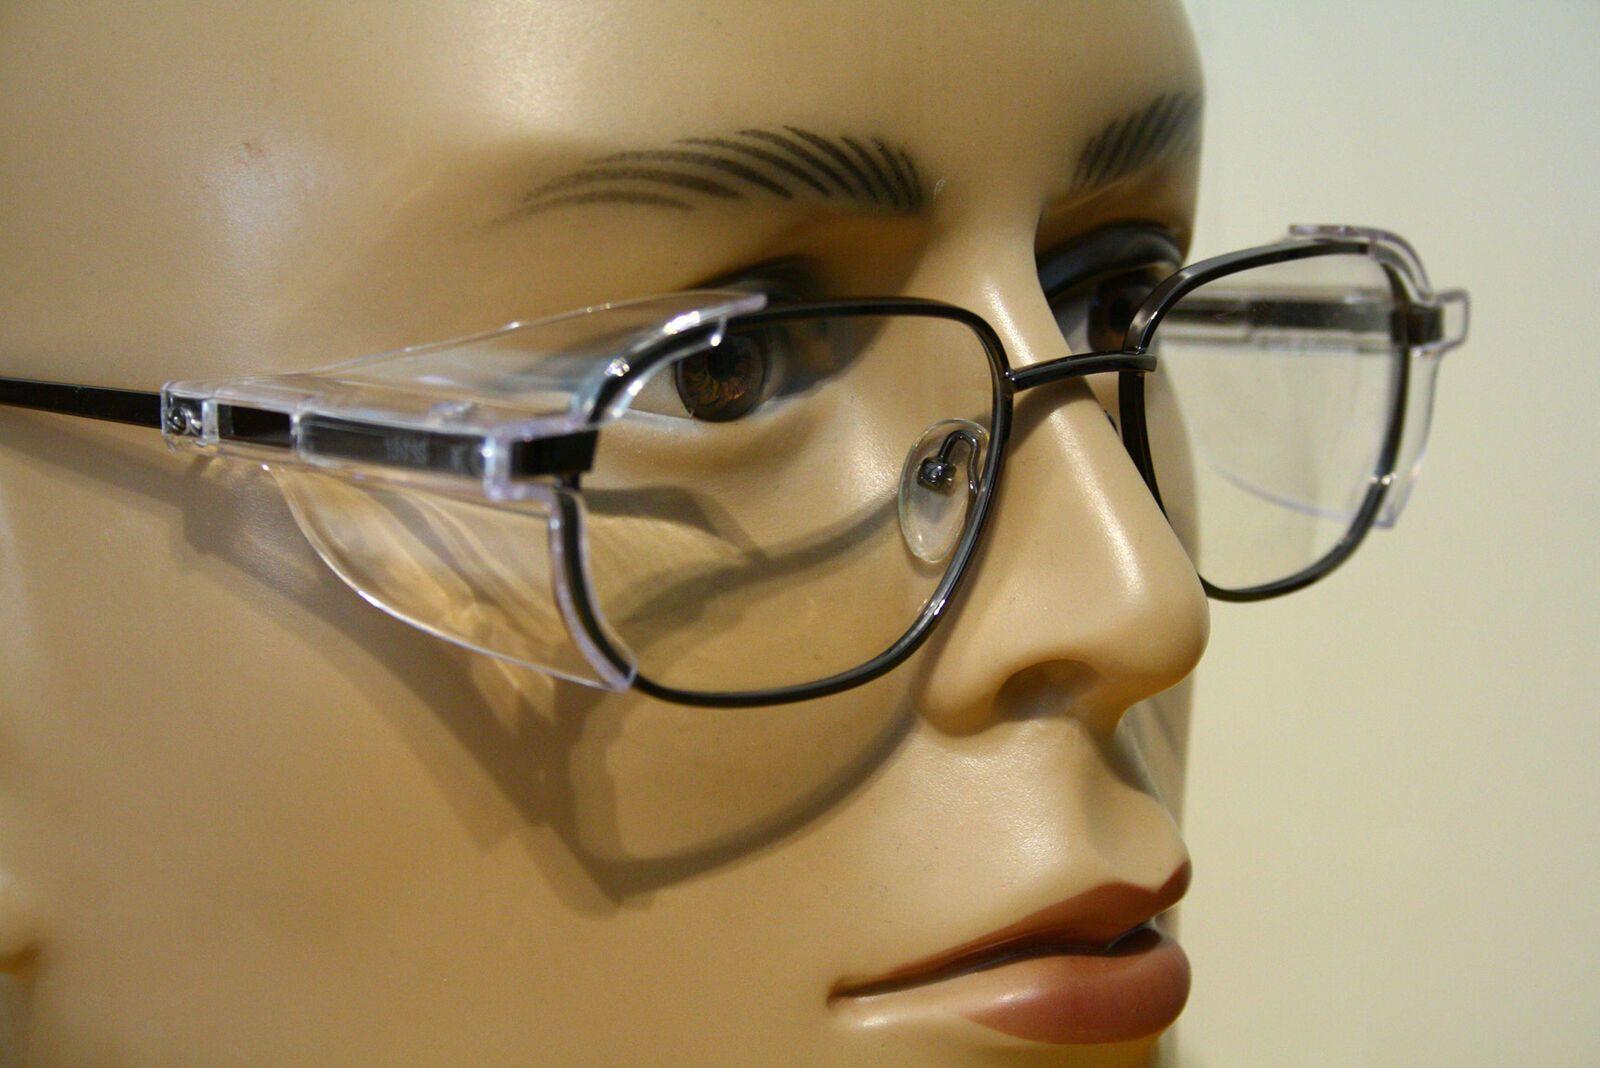 Wind Protection Air Shield Dry Eye Eyeglasses Glasses